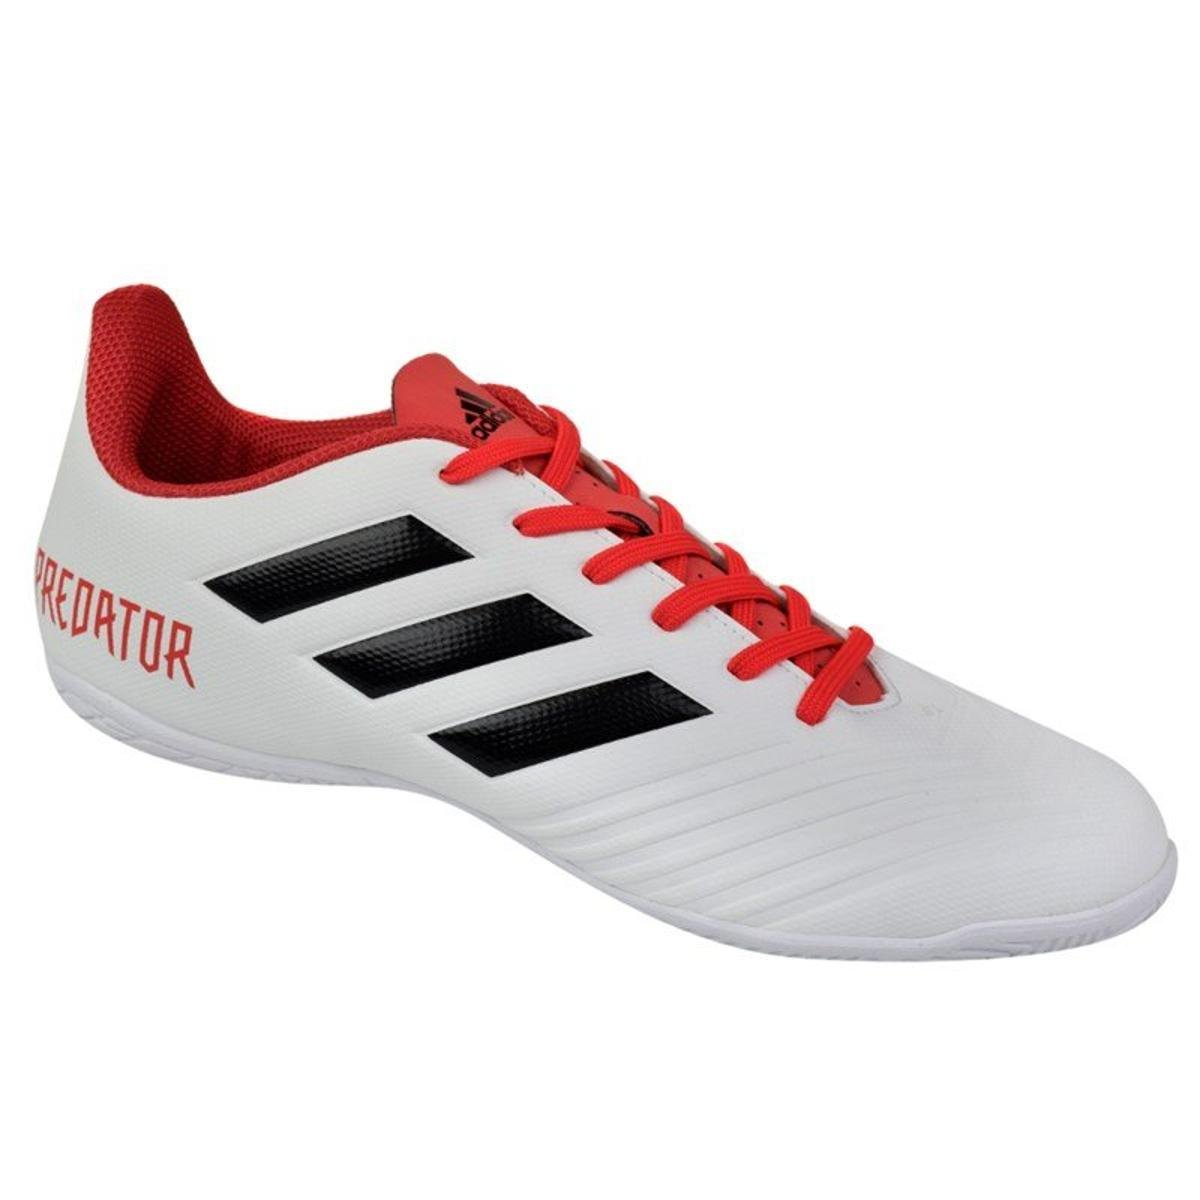 4b71e4b42d2c3 ... store chuteira futsal adidas predator 18.4 in pretobranco 48362 88621